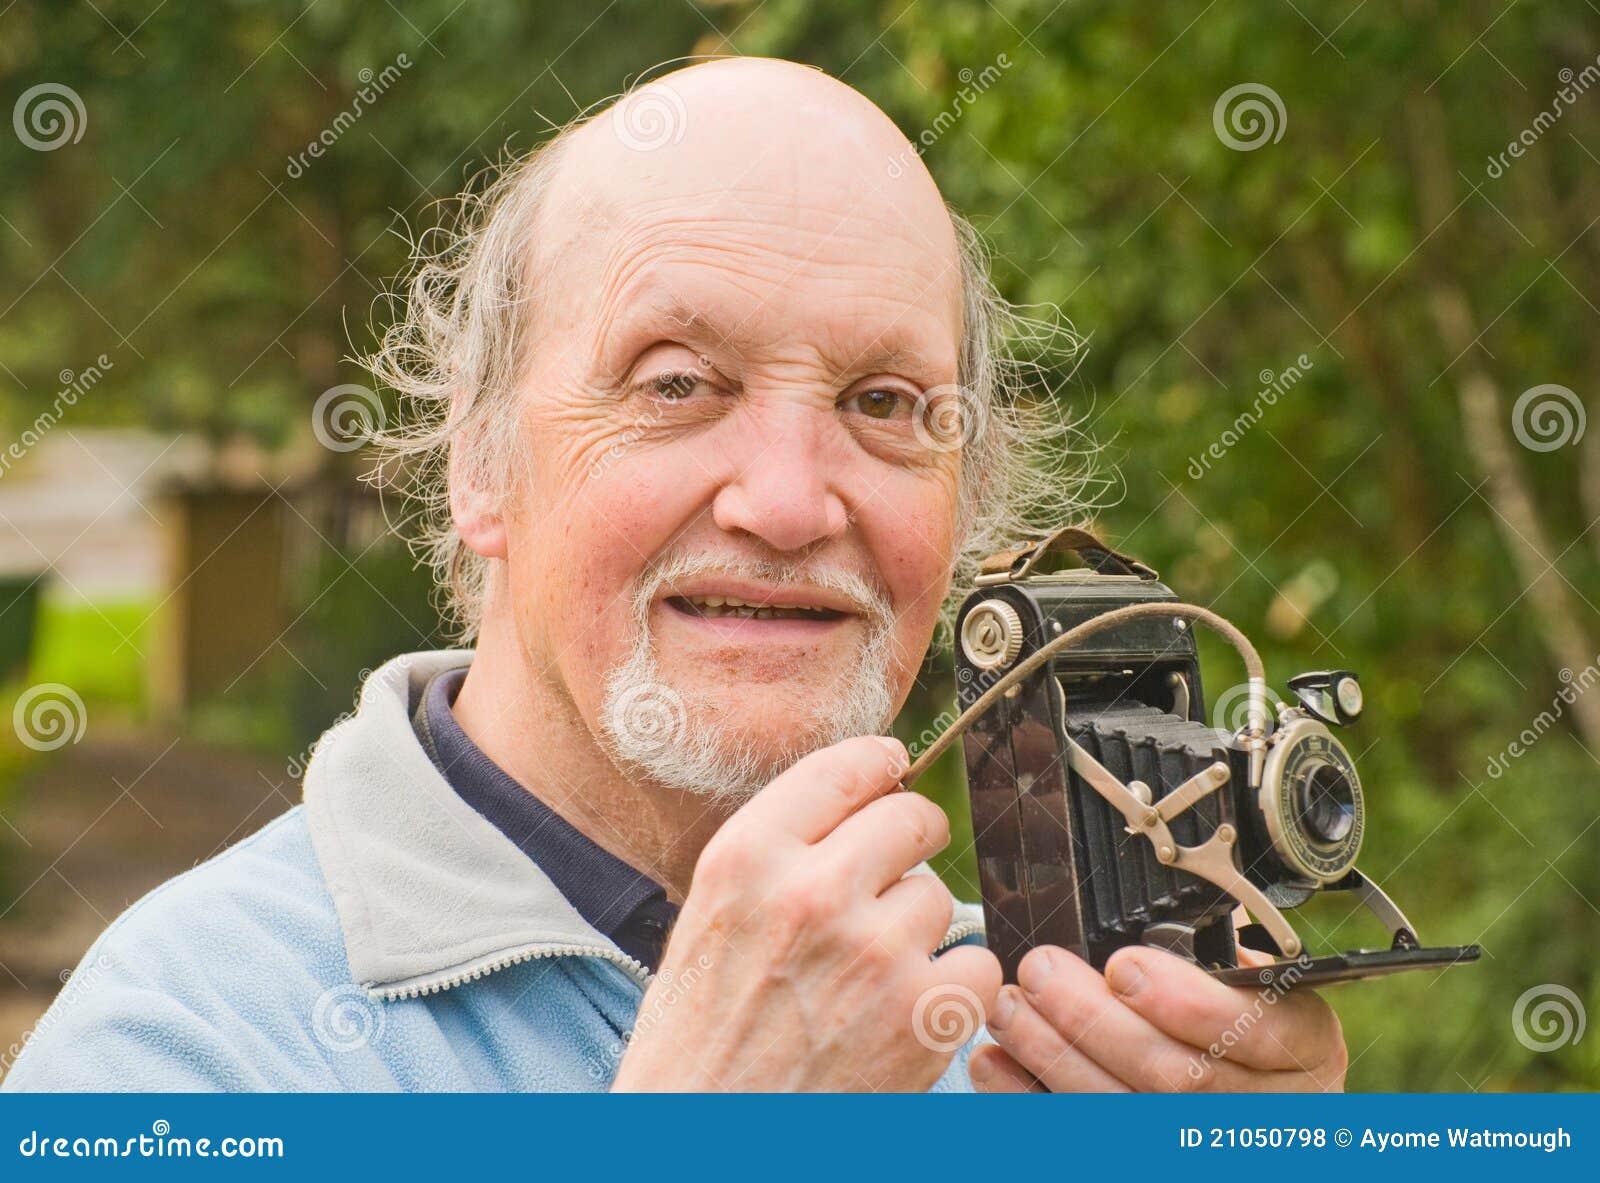 Professor with retro camera .